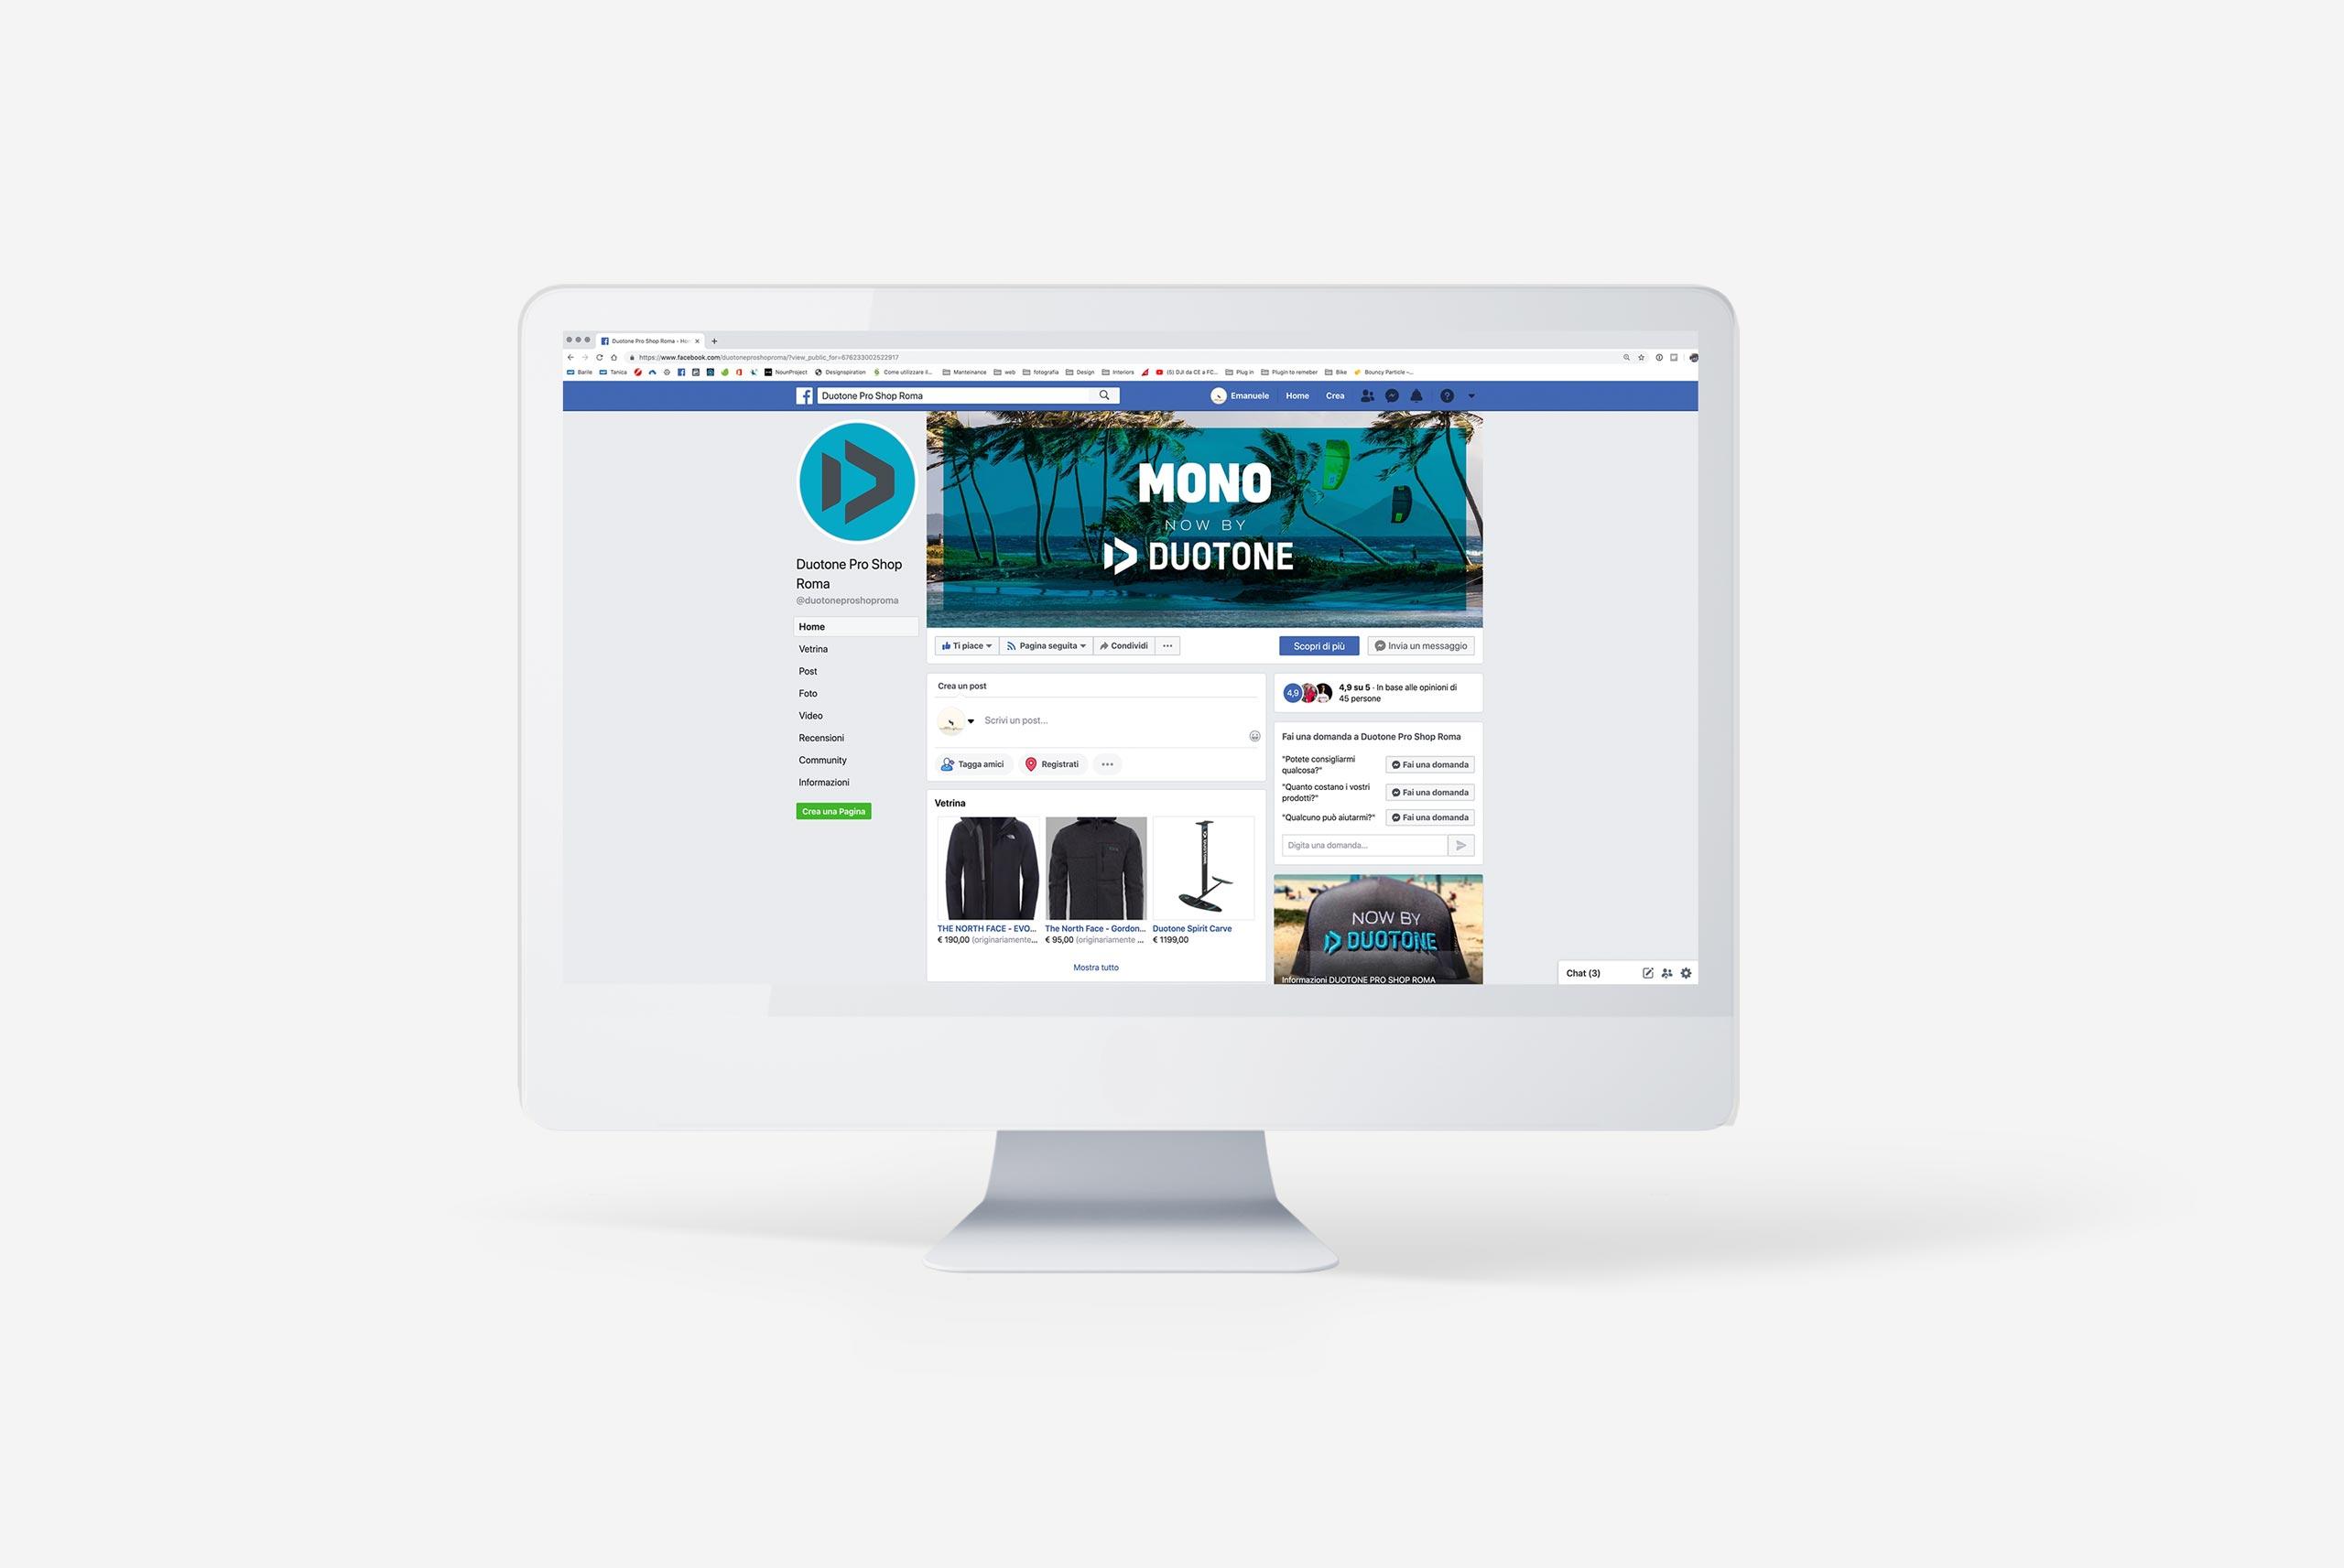 bouncy-particle-comunicazione-marketing-duotone-pro-shop-roma